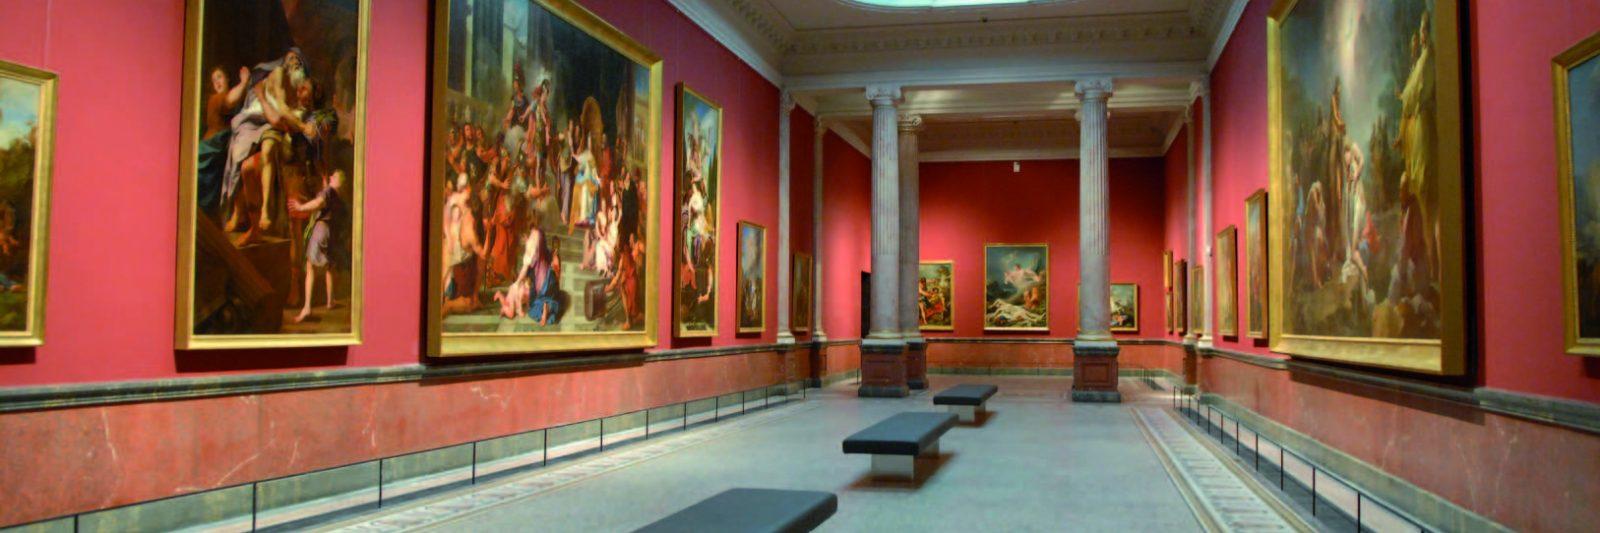 fabre museum montpellier